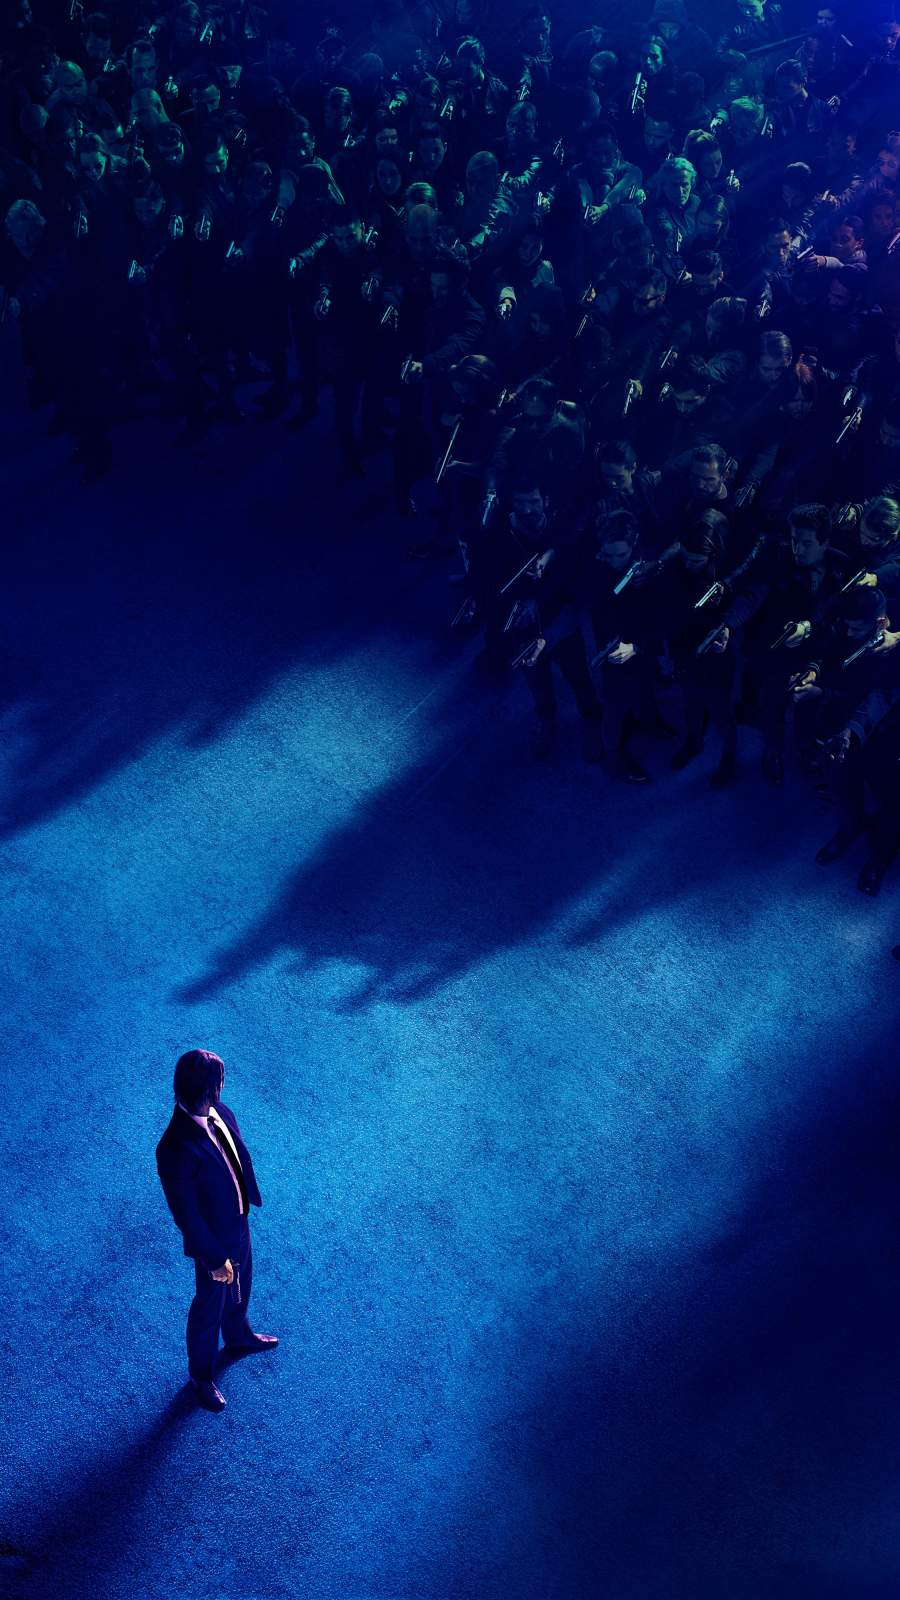 John Wick vs Underworld iPhone Wallpaper